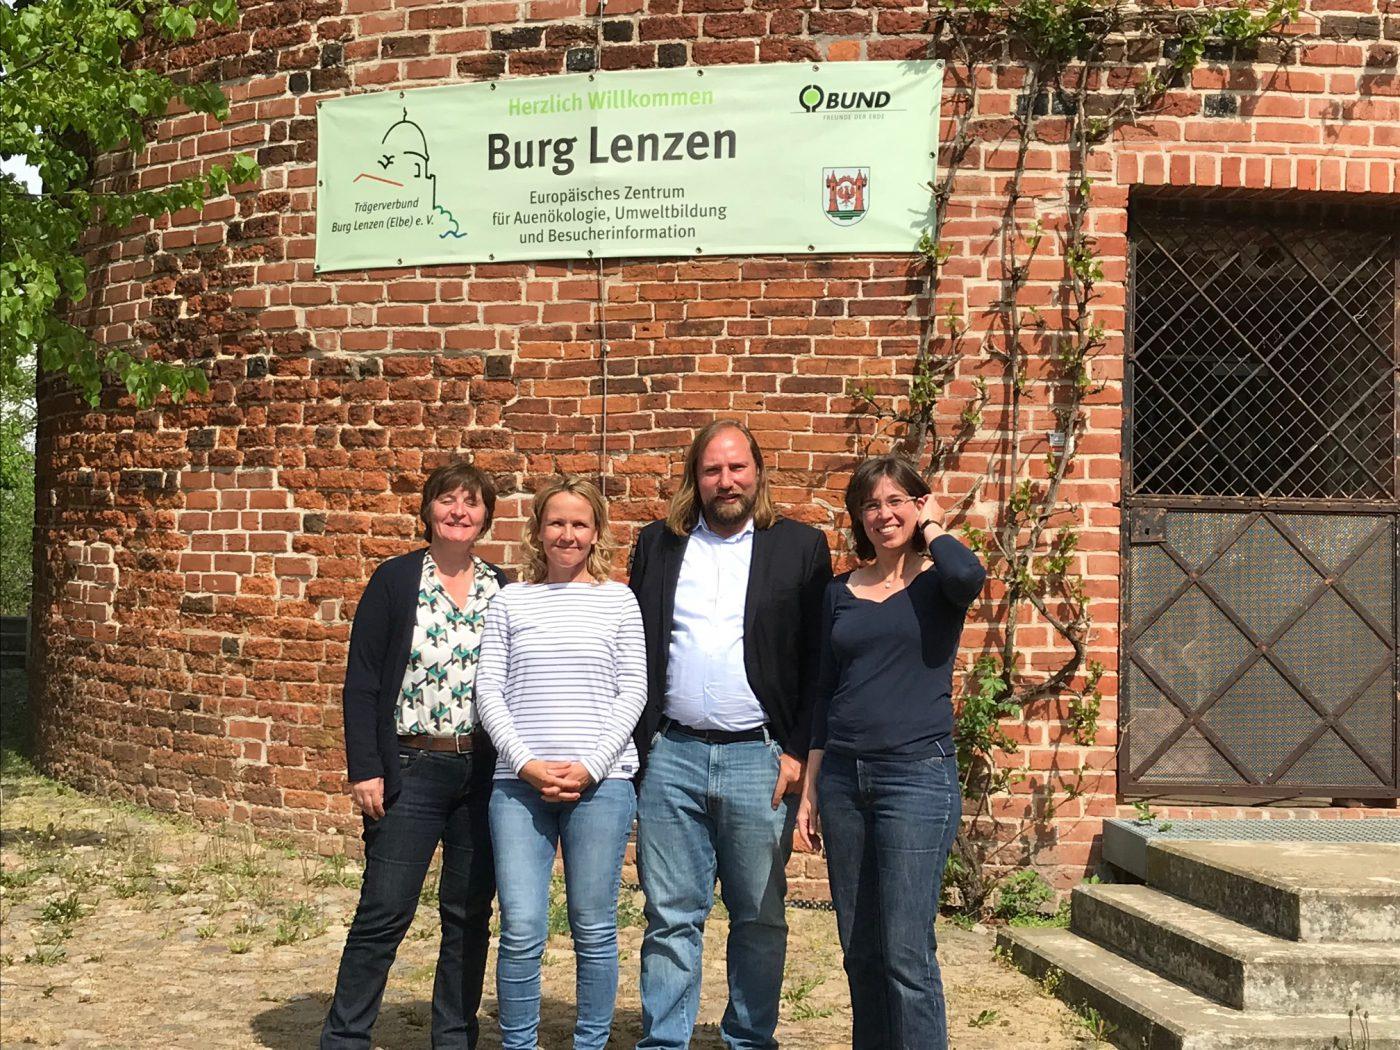 Bundesgrüne auf Burg Lenzen_Rüdiger Herzog